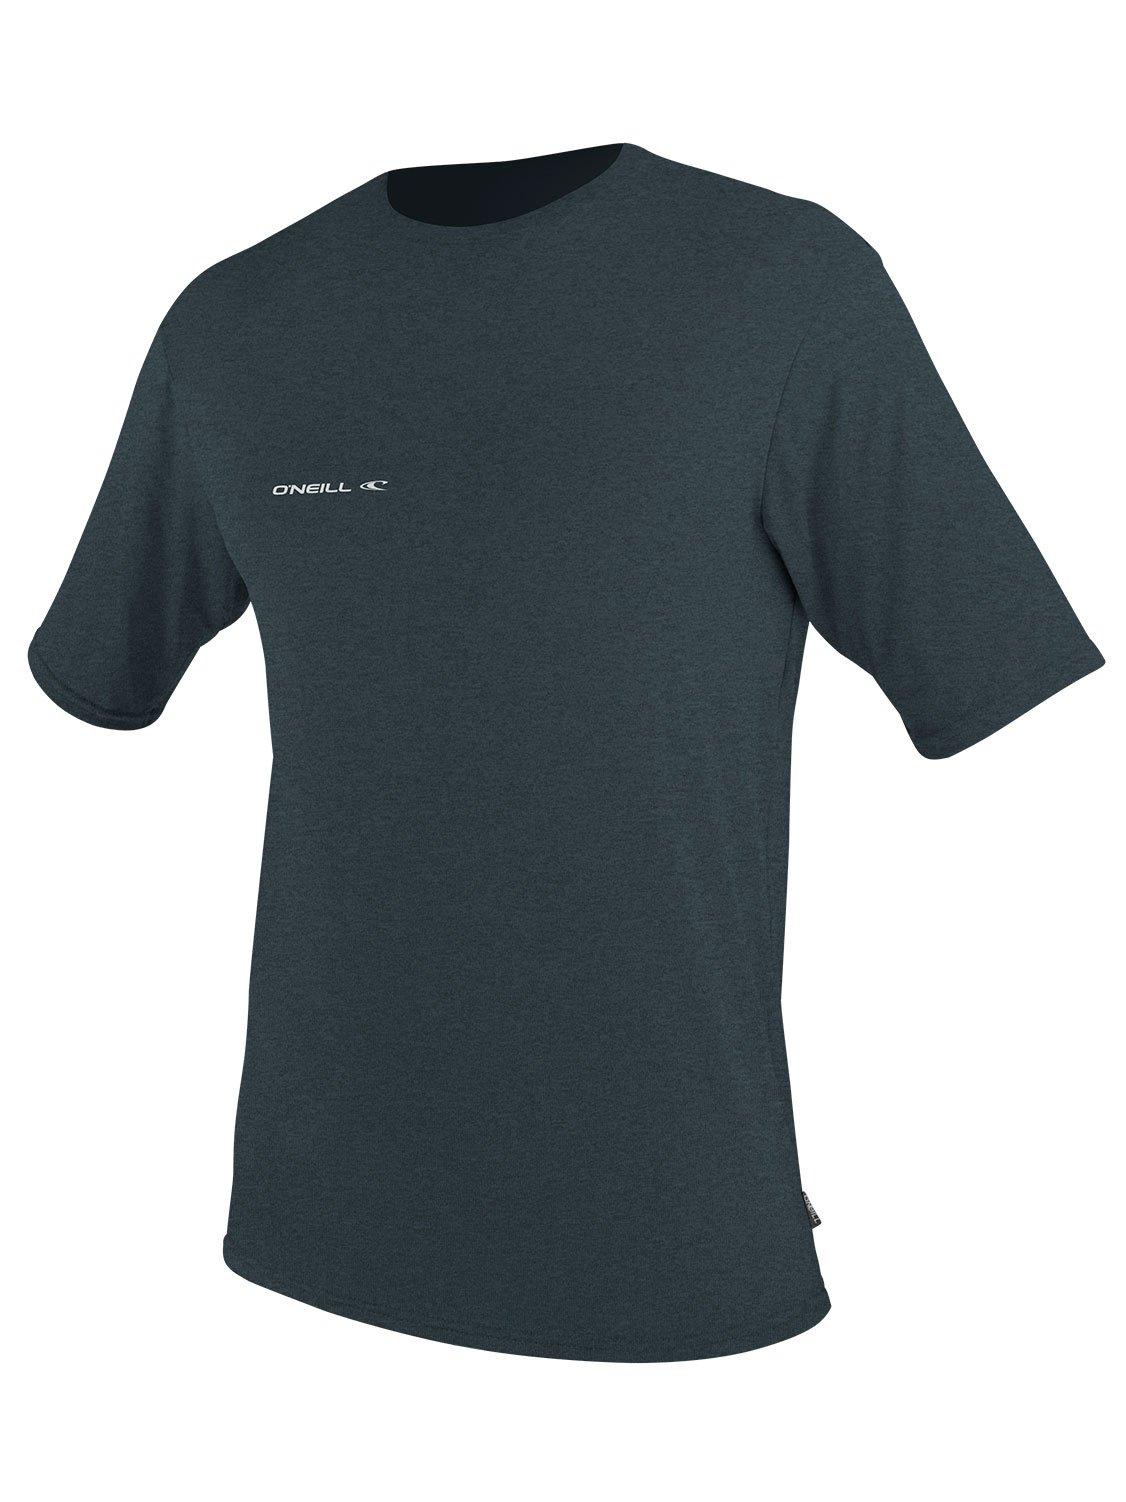 O'Neill  Men's Hybrid UPF 50+ Short Sleeve Sun Shirt, Slate,Small by O'NEILL